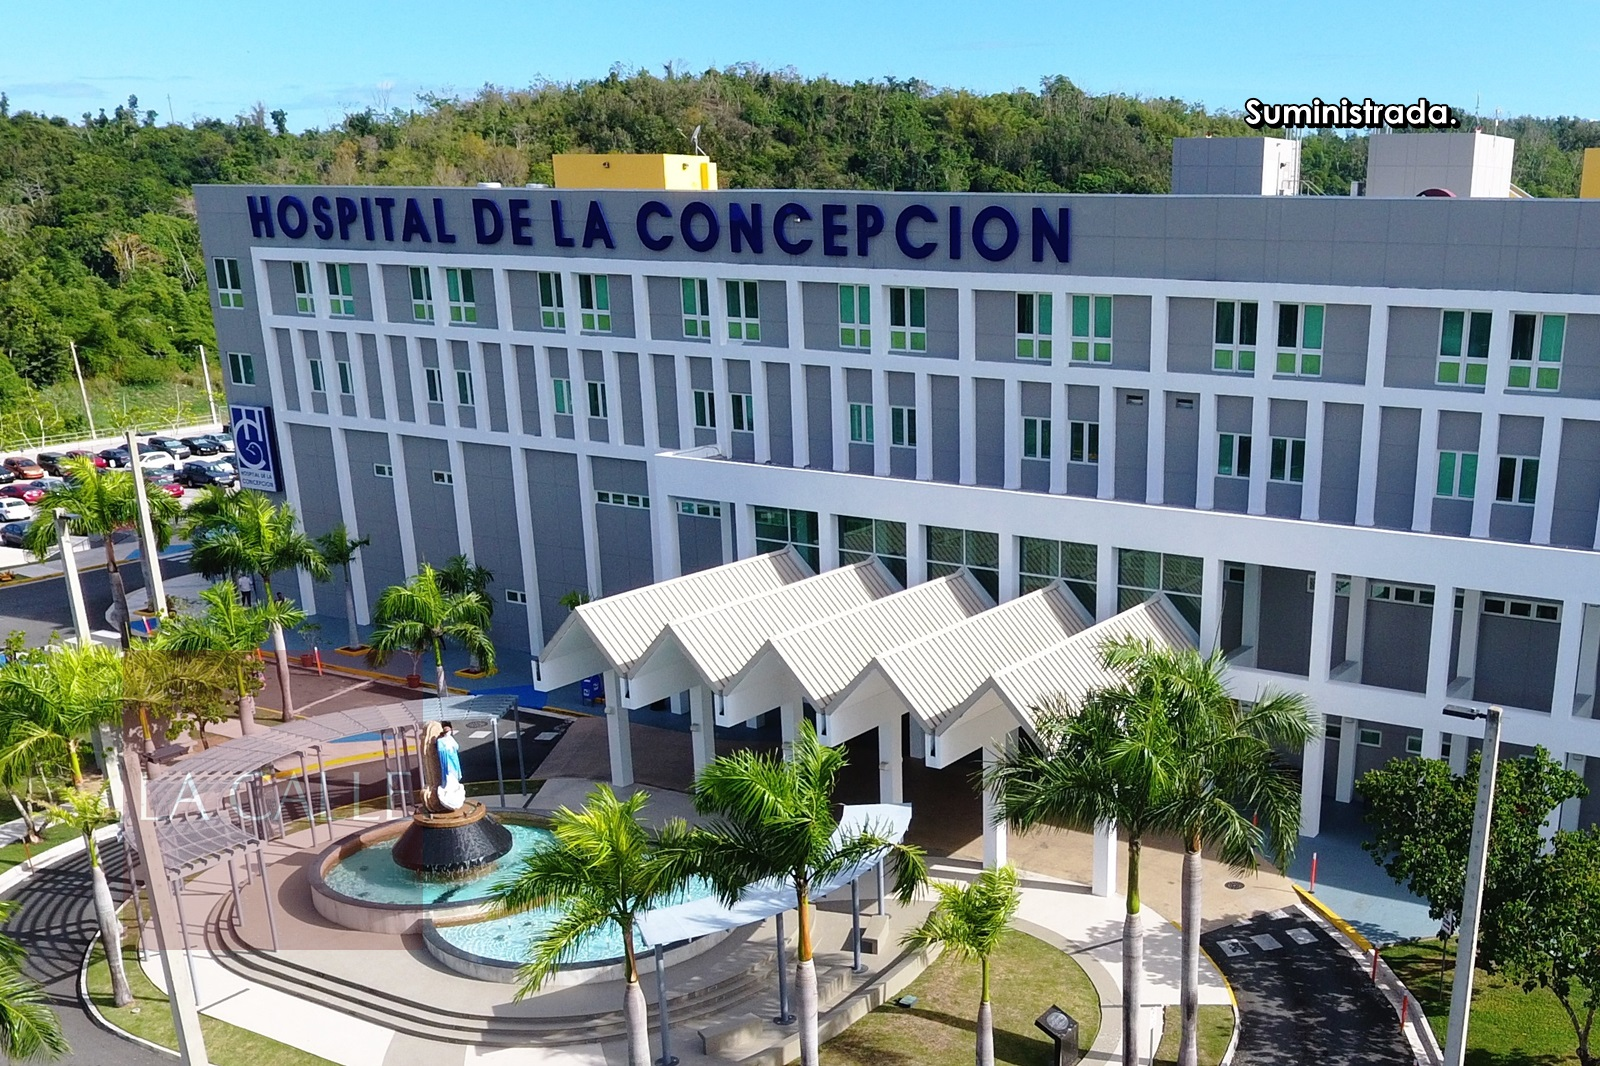 Hospital de la Concepcion wm